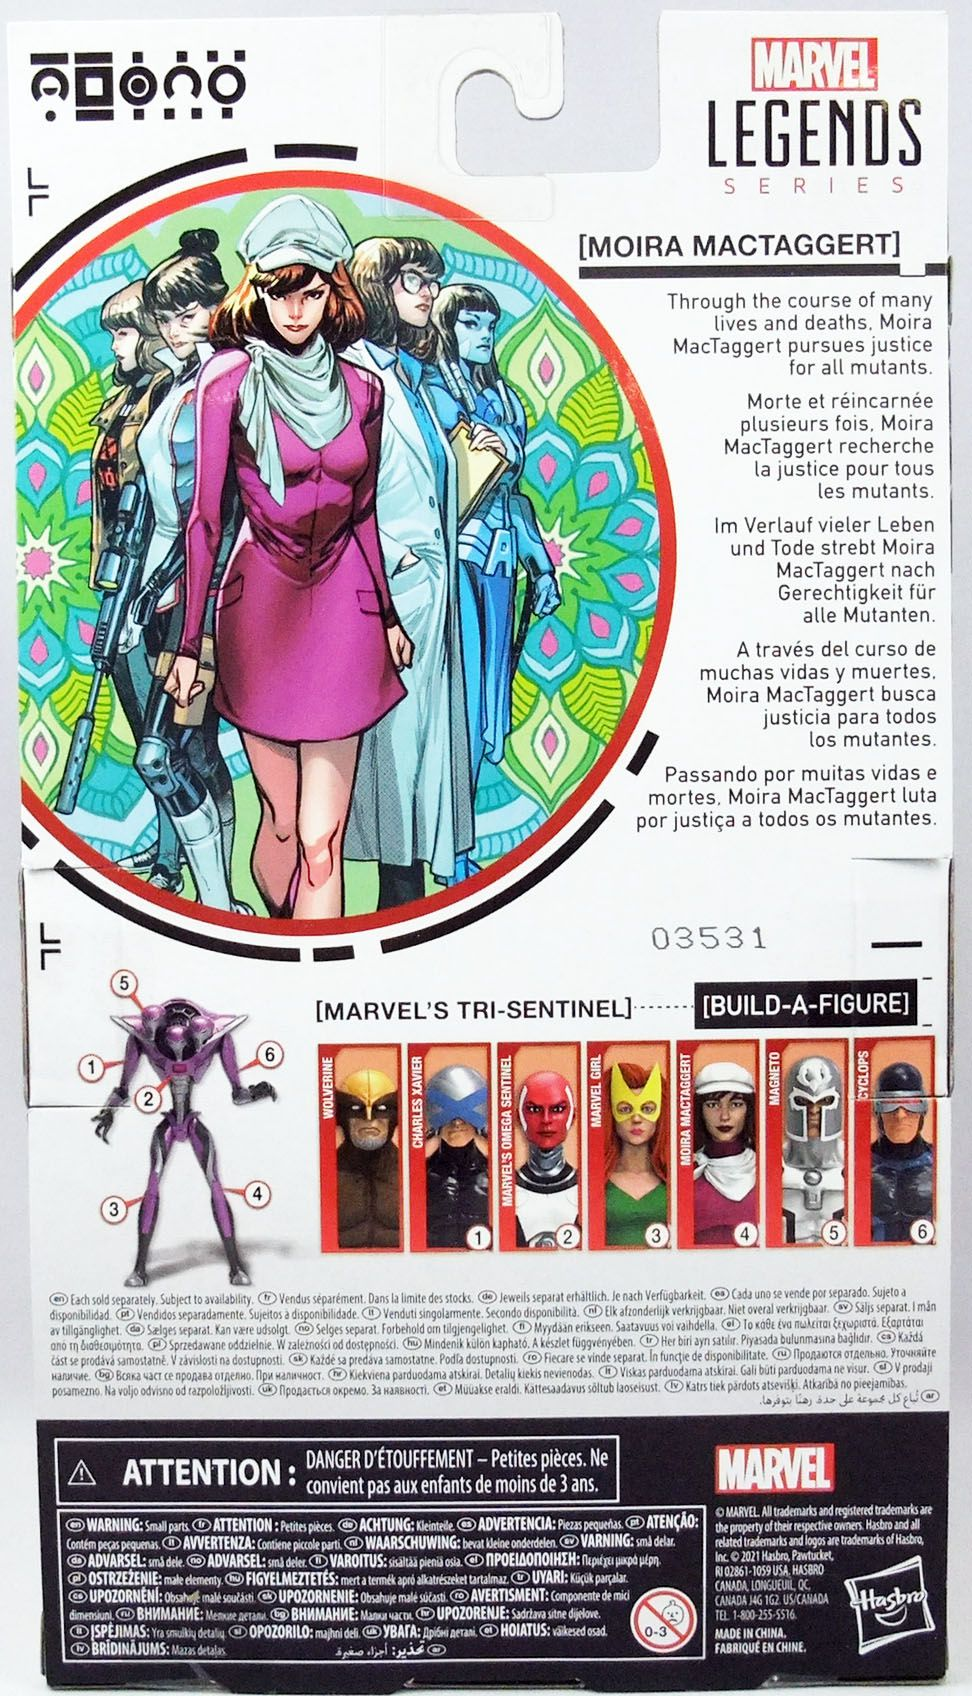 Marvel Legends - Moïra MacTaggert - Serie Hasbro (Tri-Sentinel)